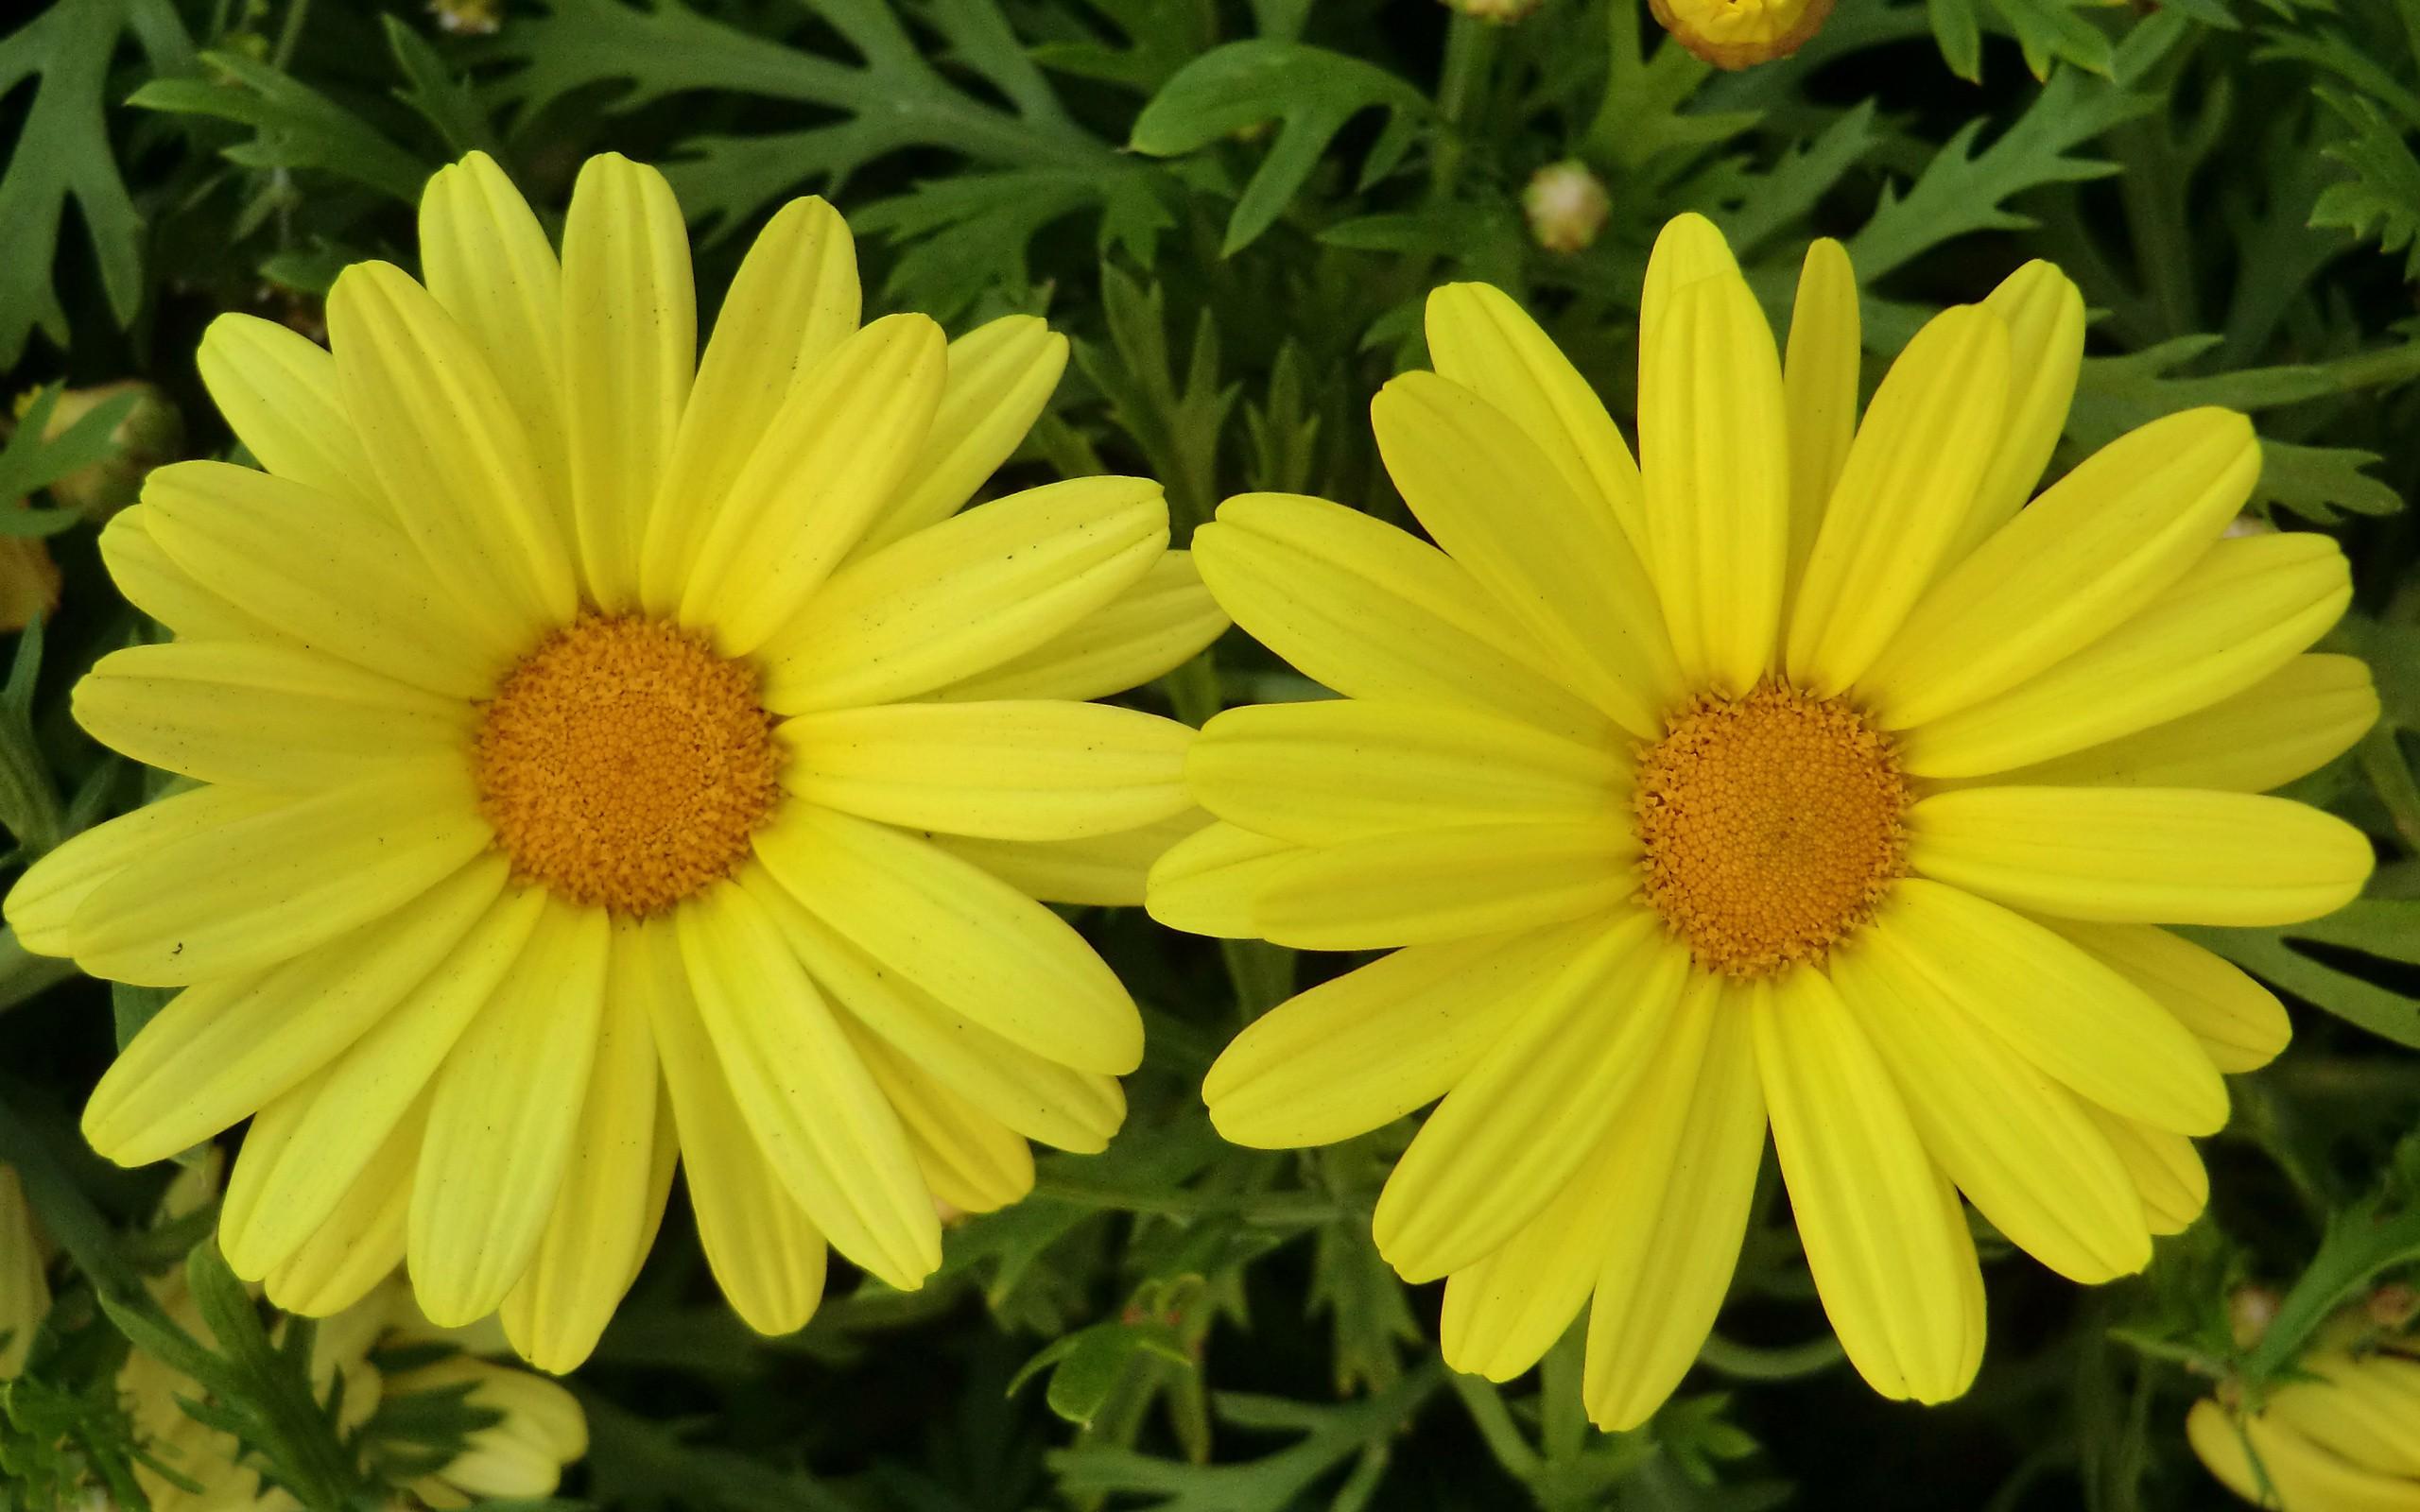 Flores amarillas - 2560x1600